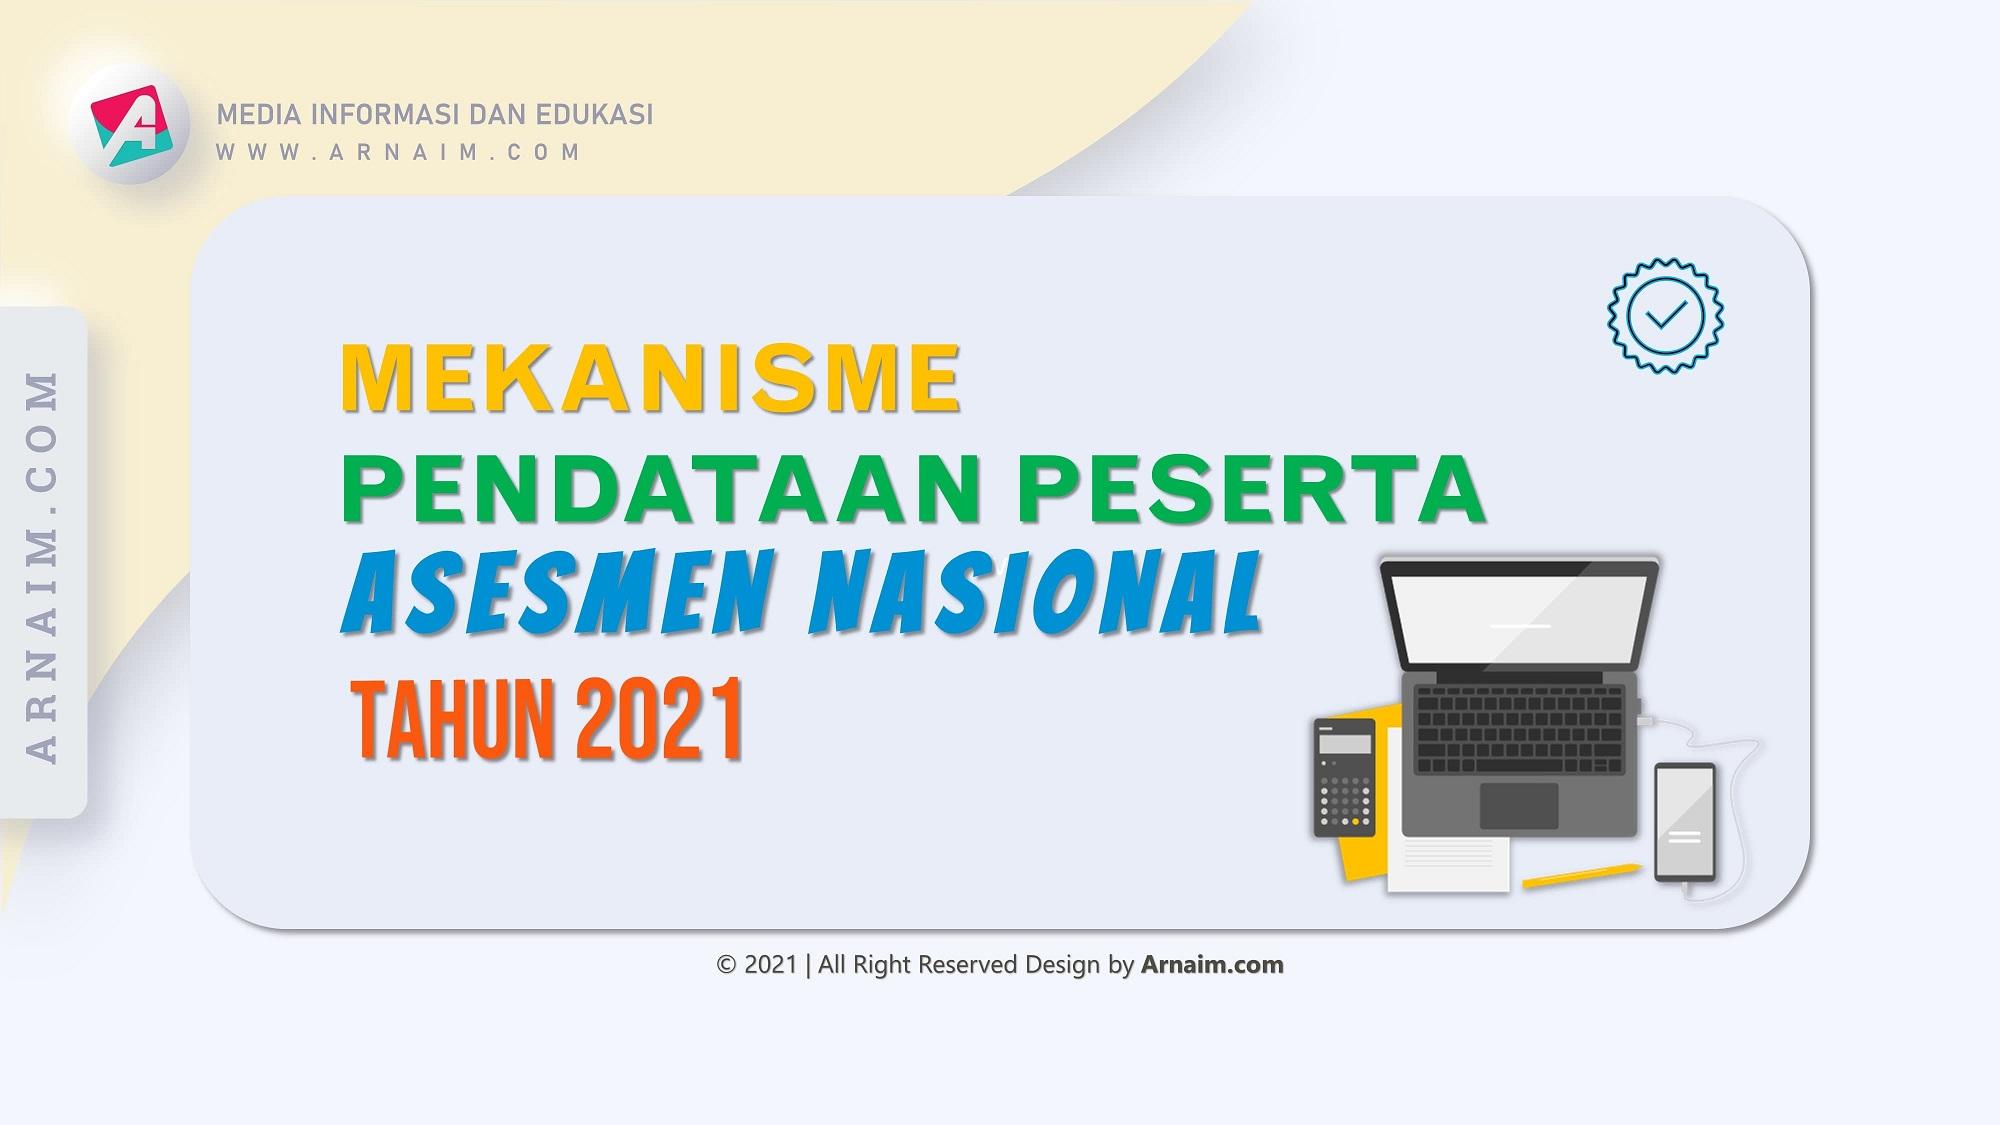 ARNAIM.COM - MEKANISME PENDATAAN PESERTA ASESMEN NASIONAL 2021